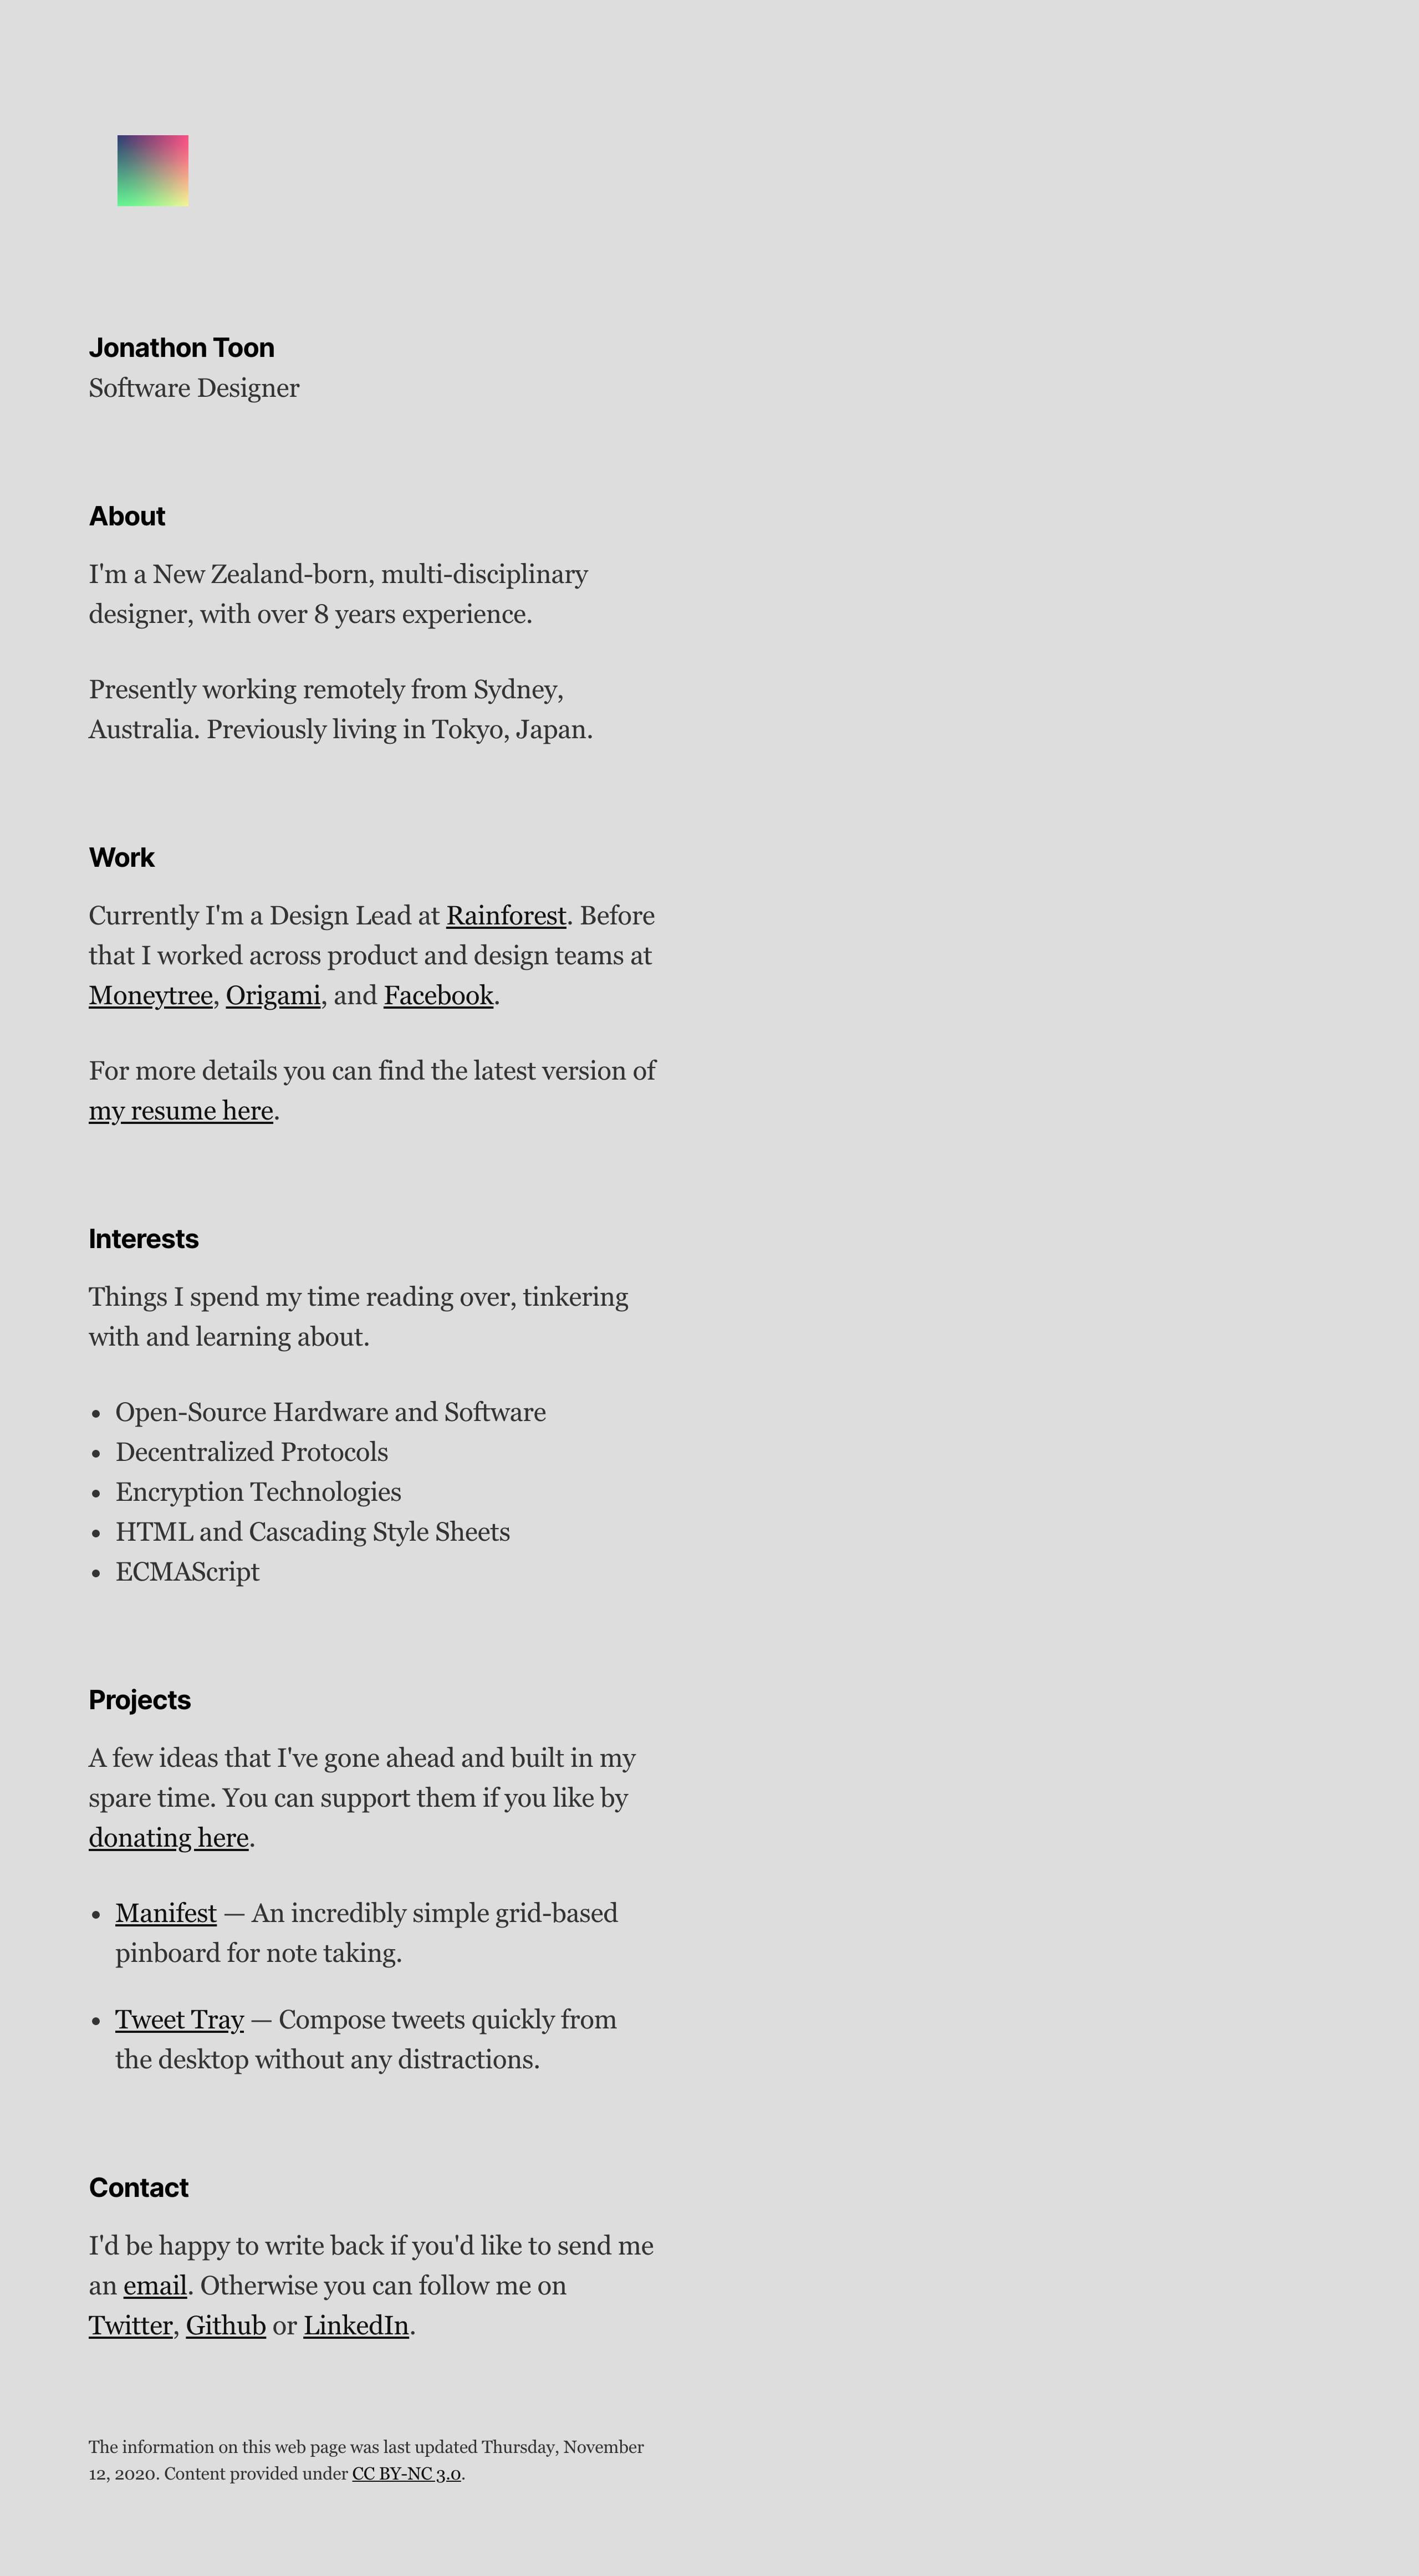 Jonathon Toon Website Screenshot